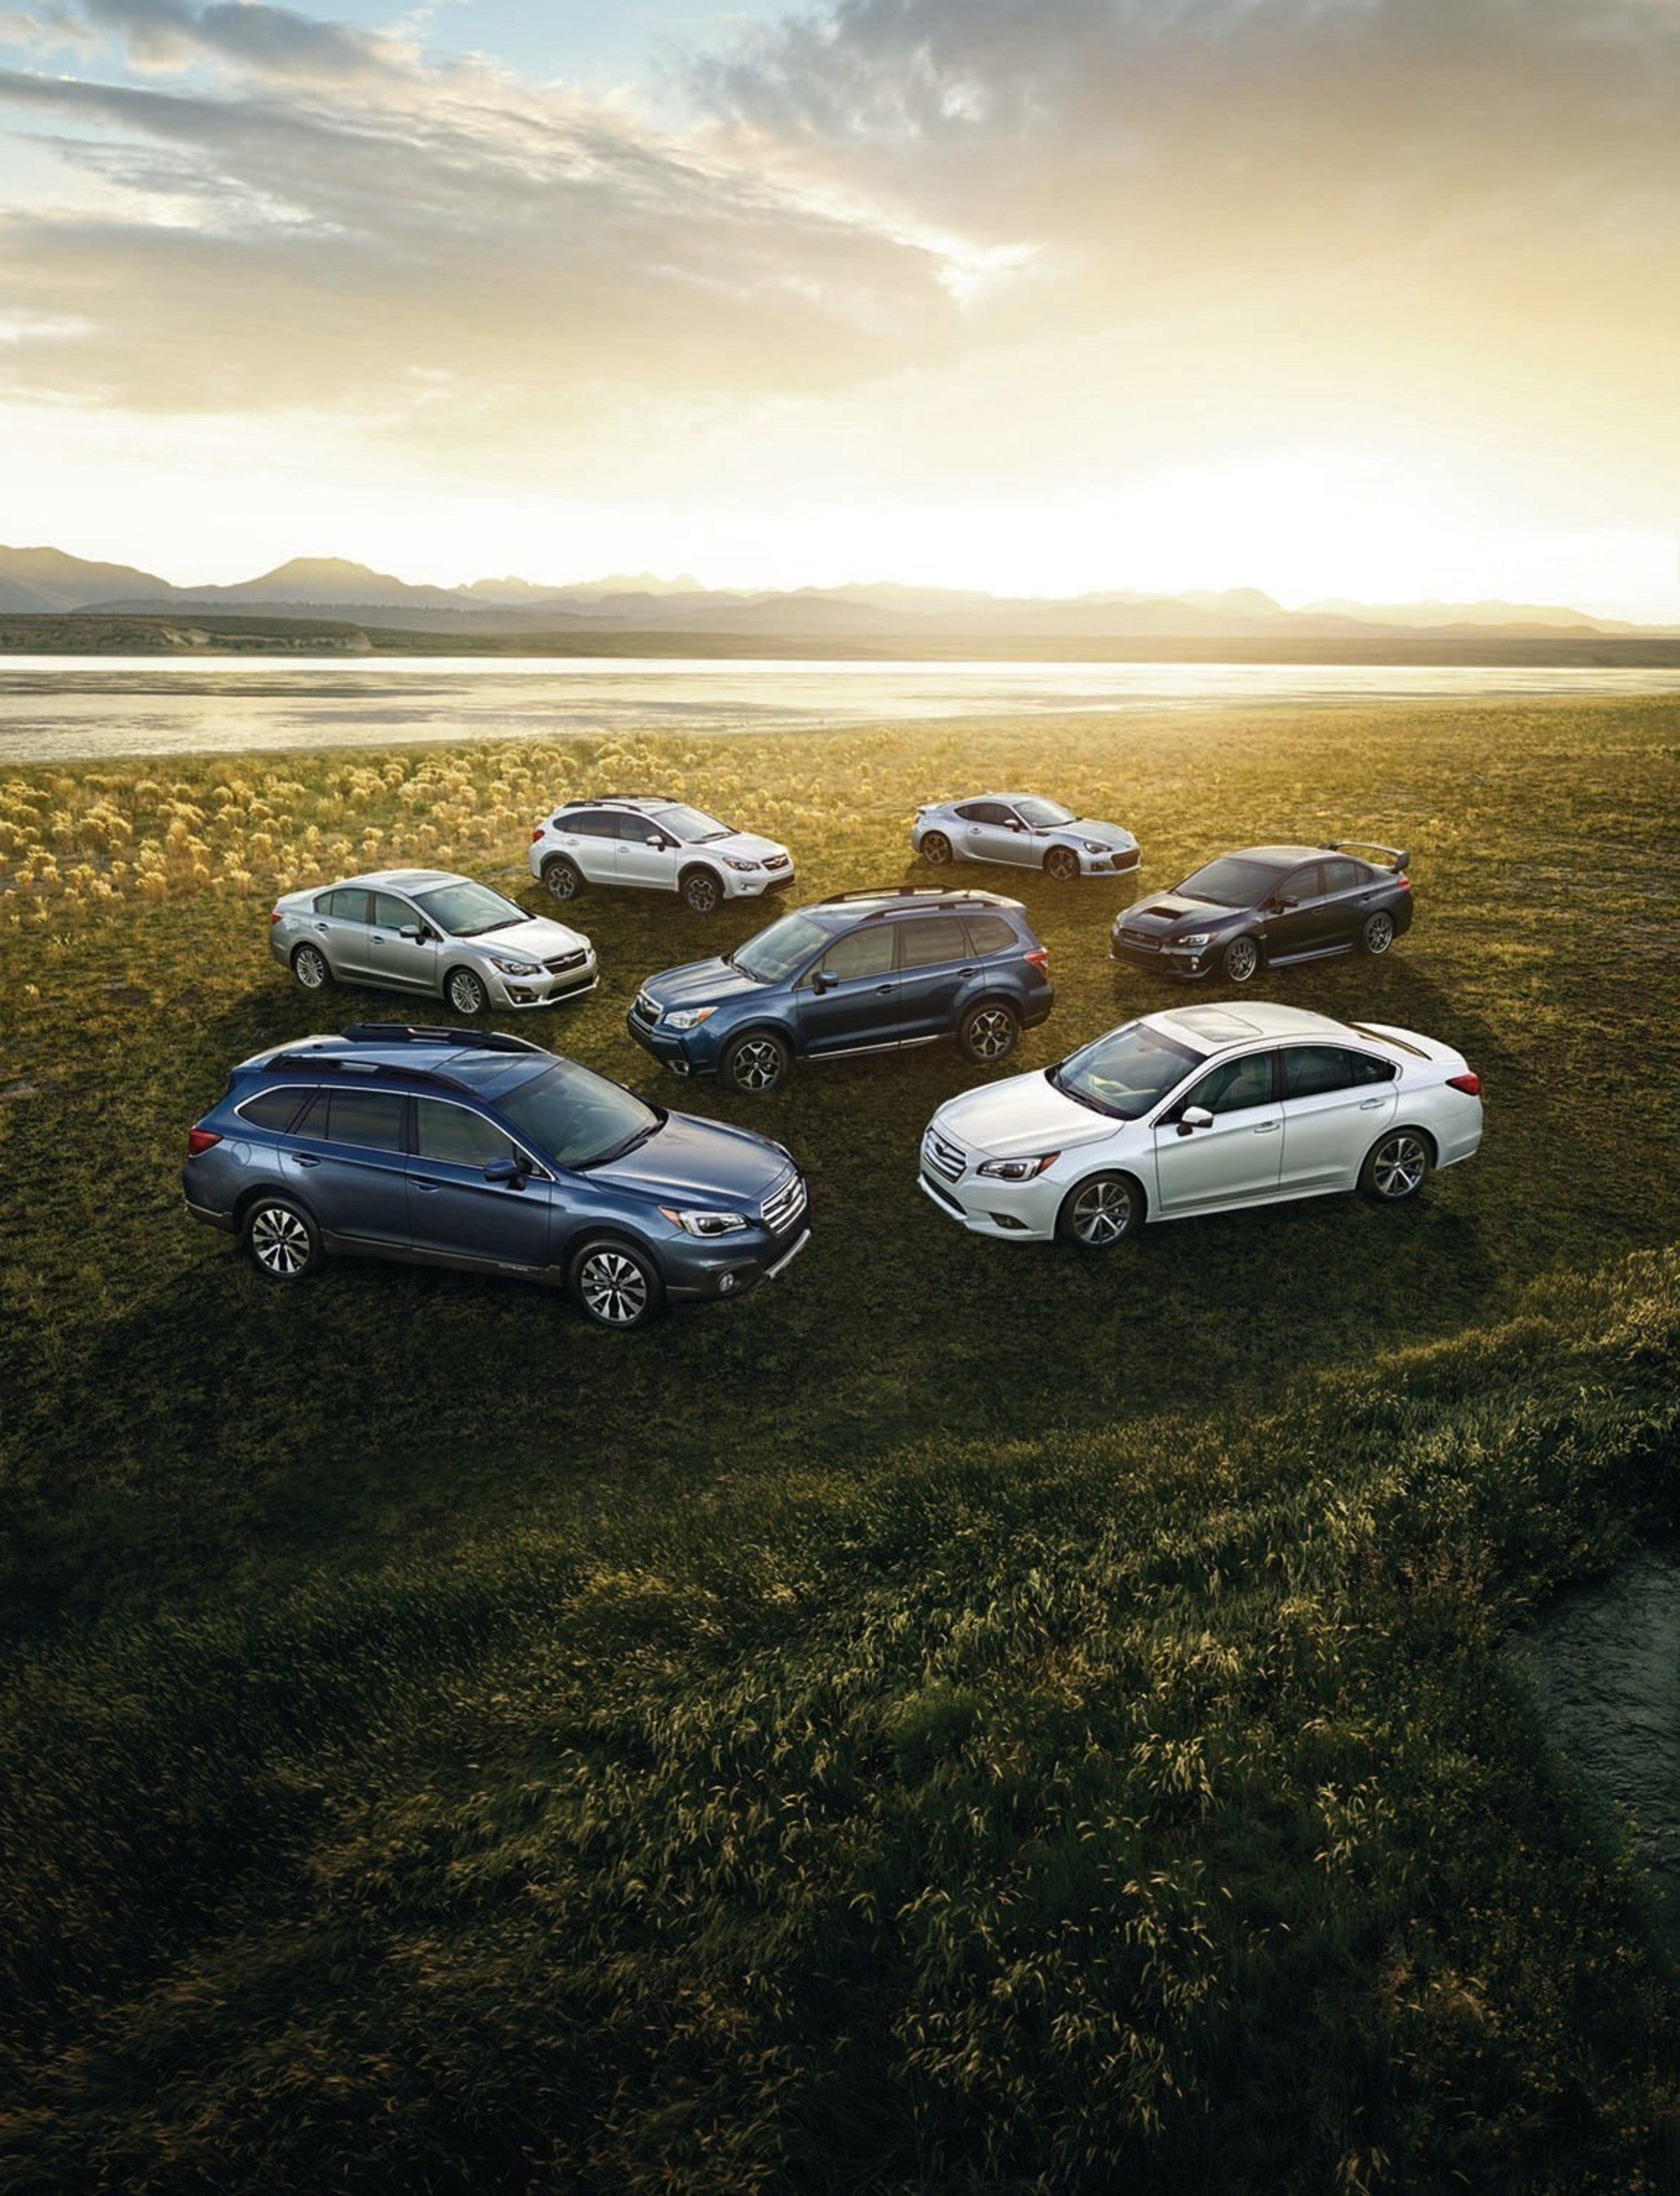 Subaru of America Breaks All-Time Sales Record Ahead of November Sales Reporting